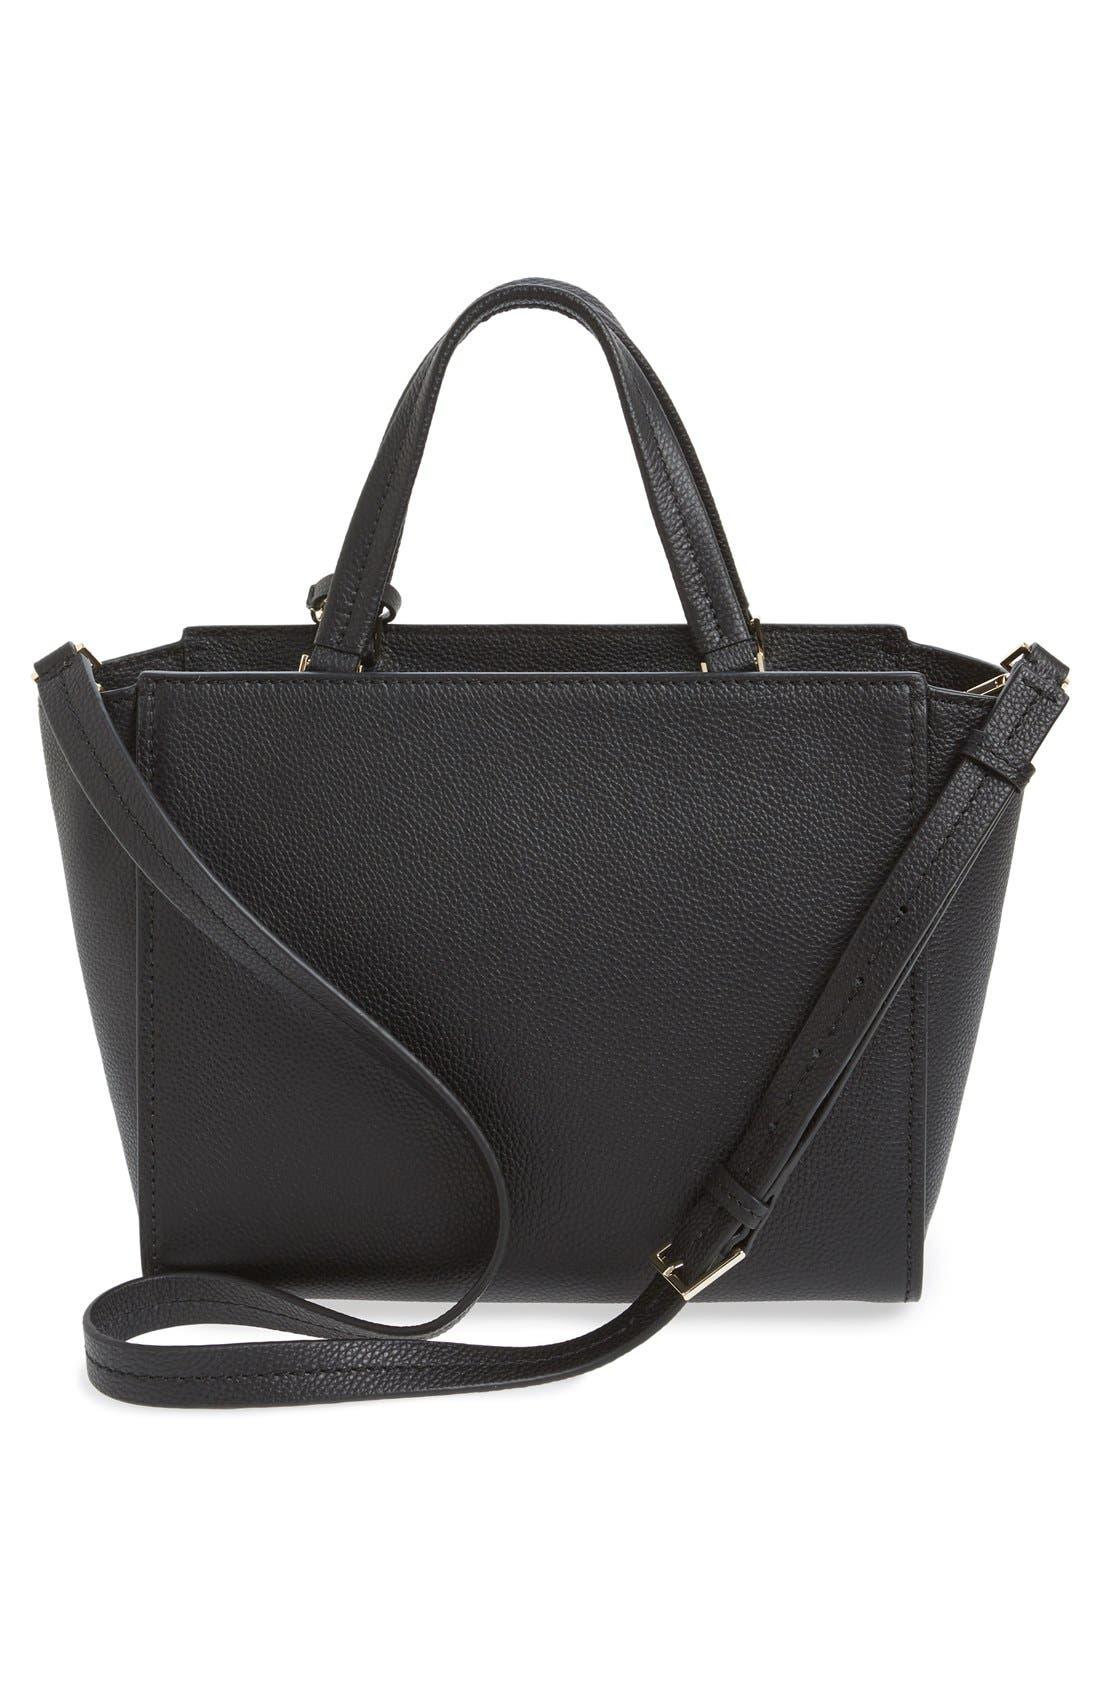 Alternate Image 3  - kate spade new york 'orchard street - dillon' tassel leather satchel